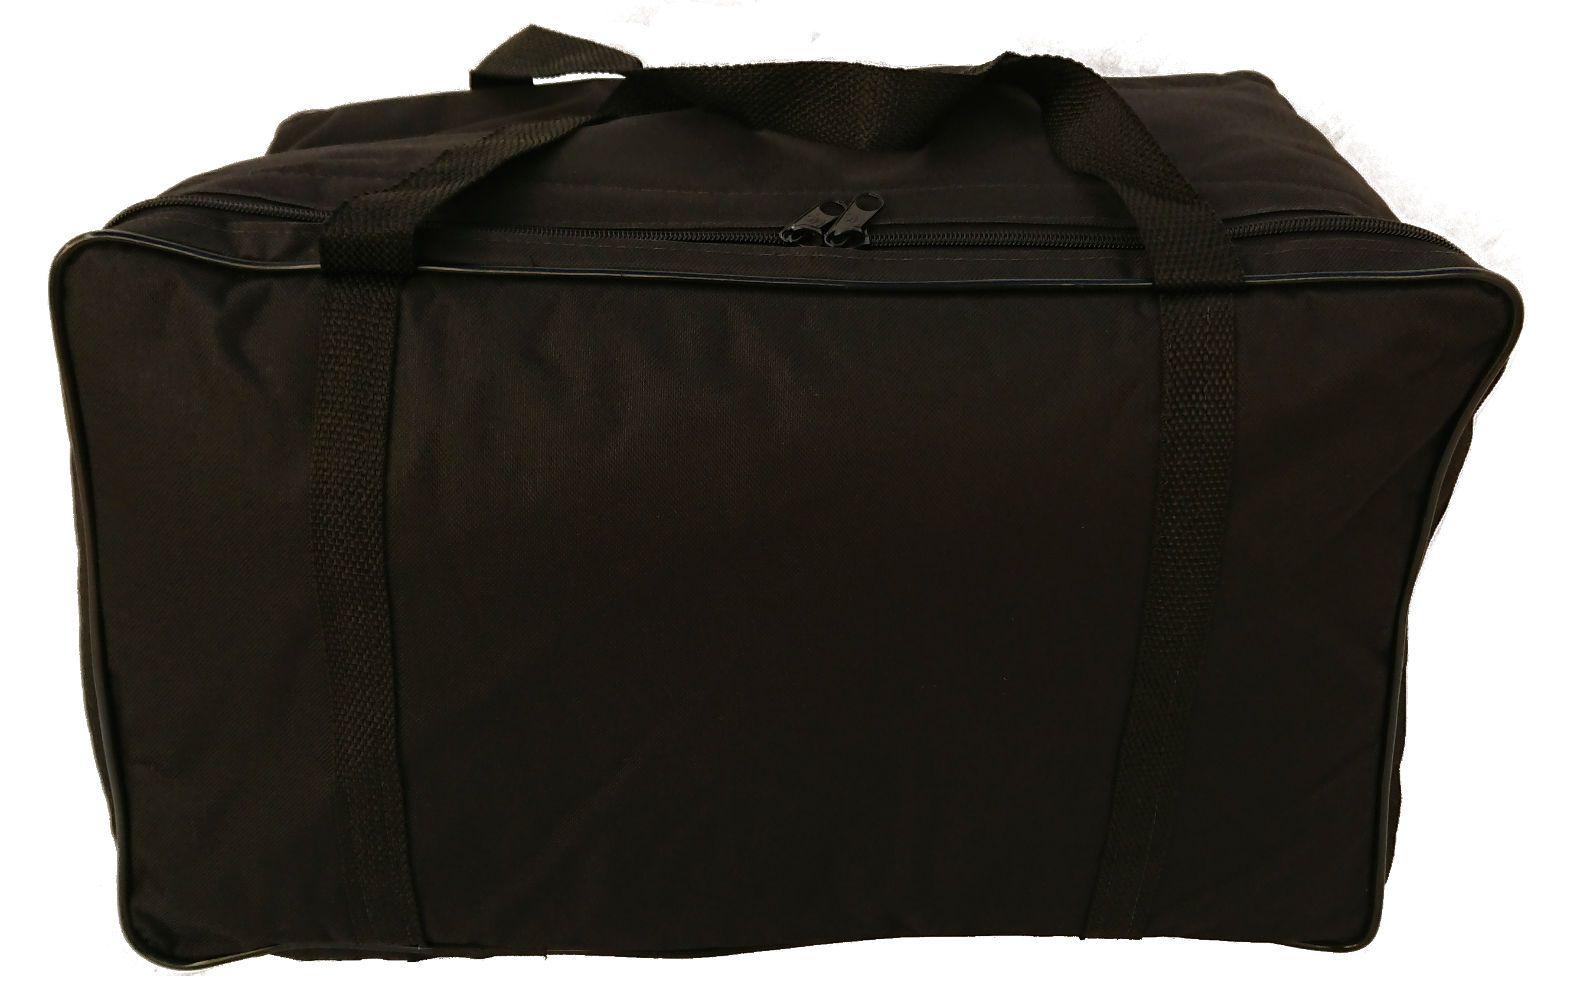 Capa Bag para Pedal Simples de Bateria, modelo Super Luxo CLAVE & BAG. Totalmente acolchoado